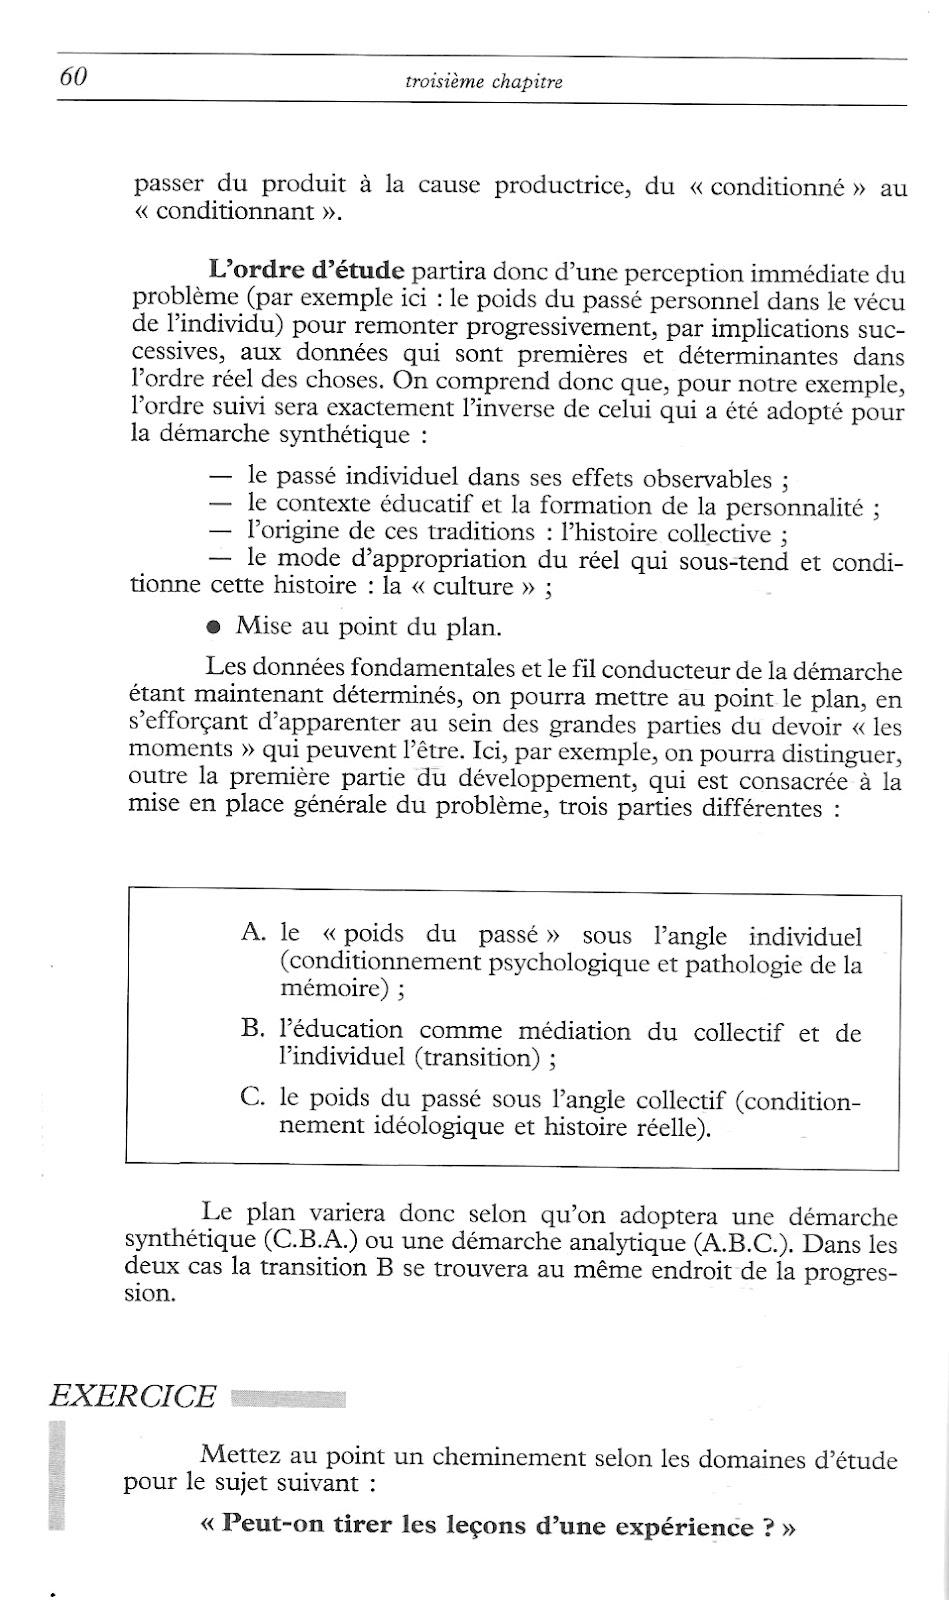 Dissertation de